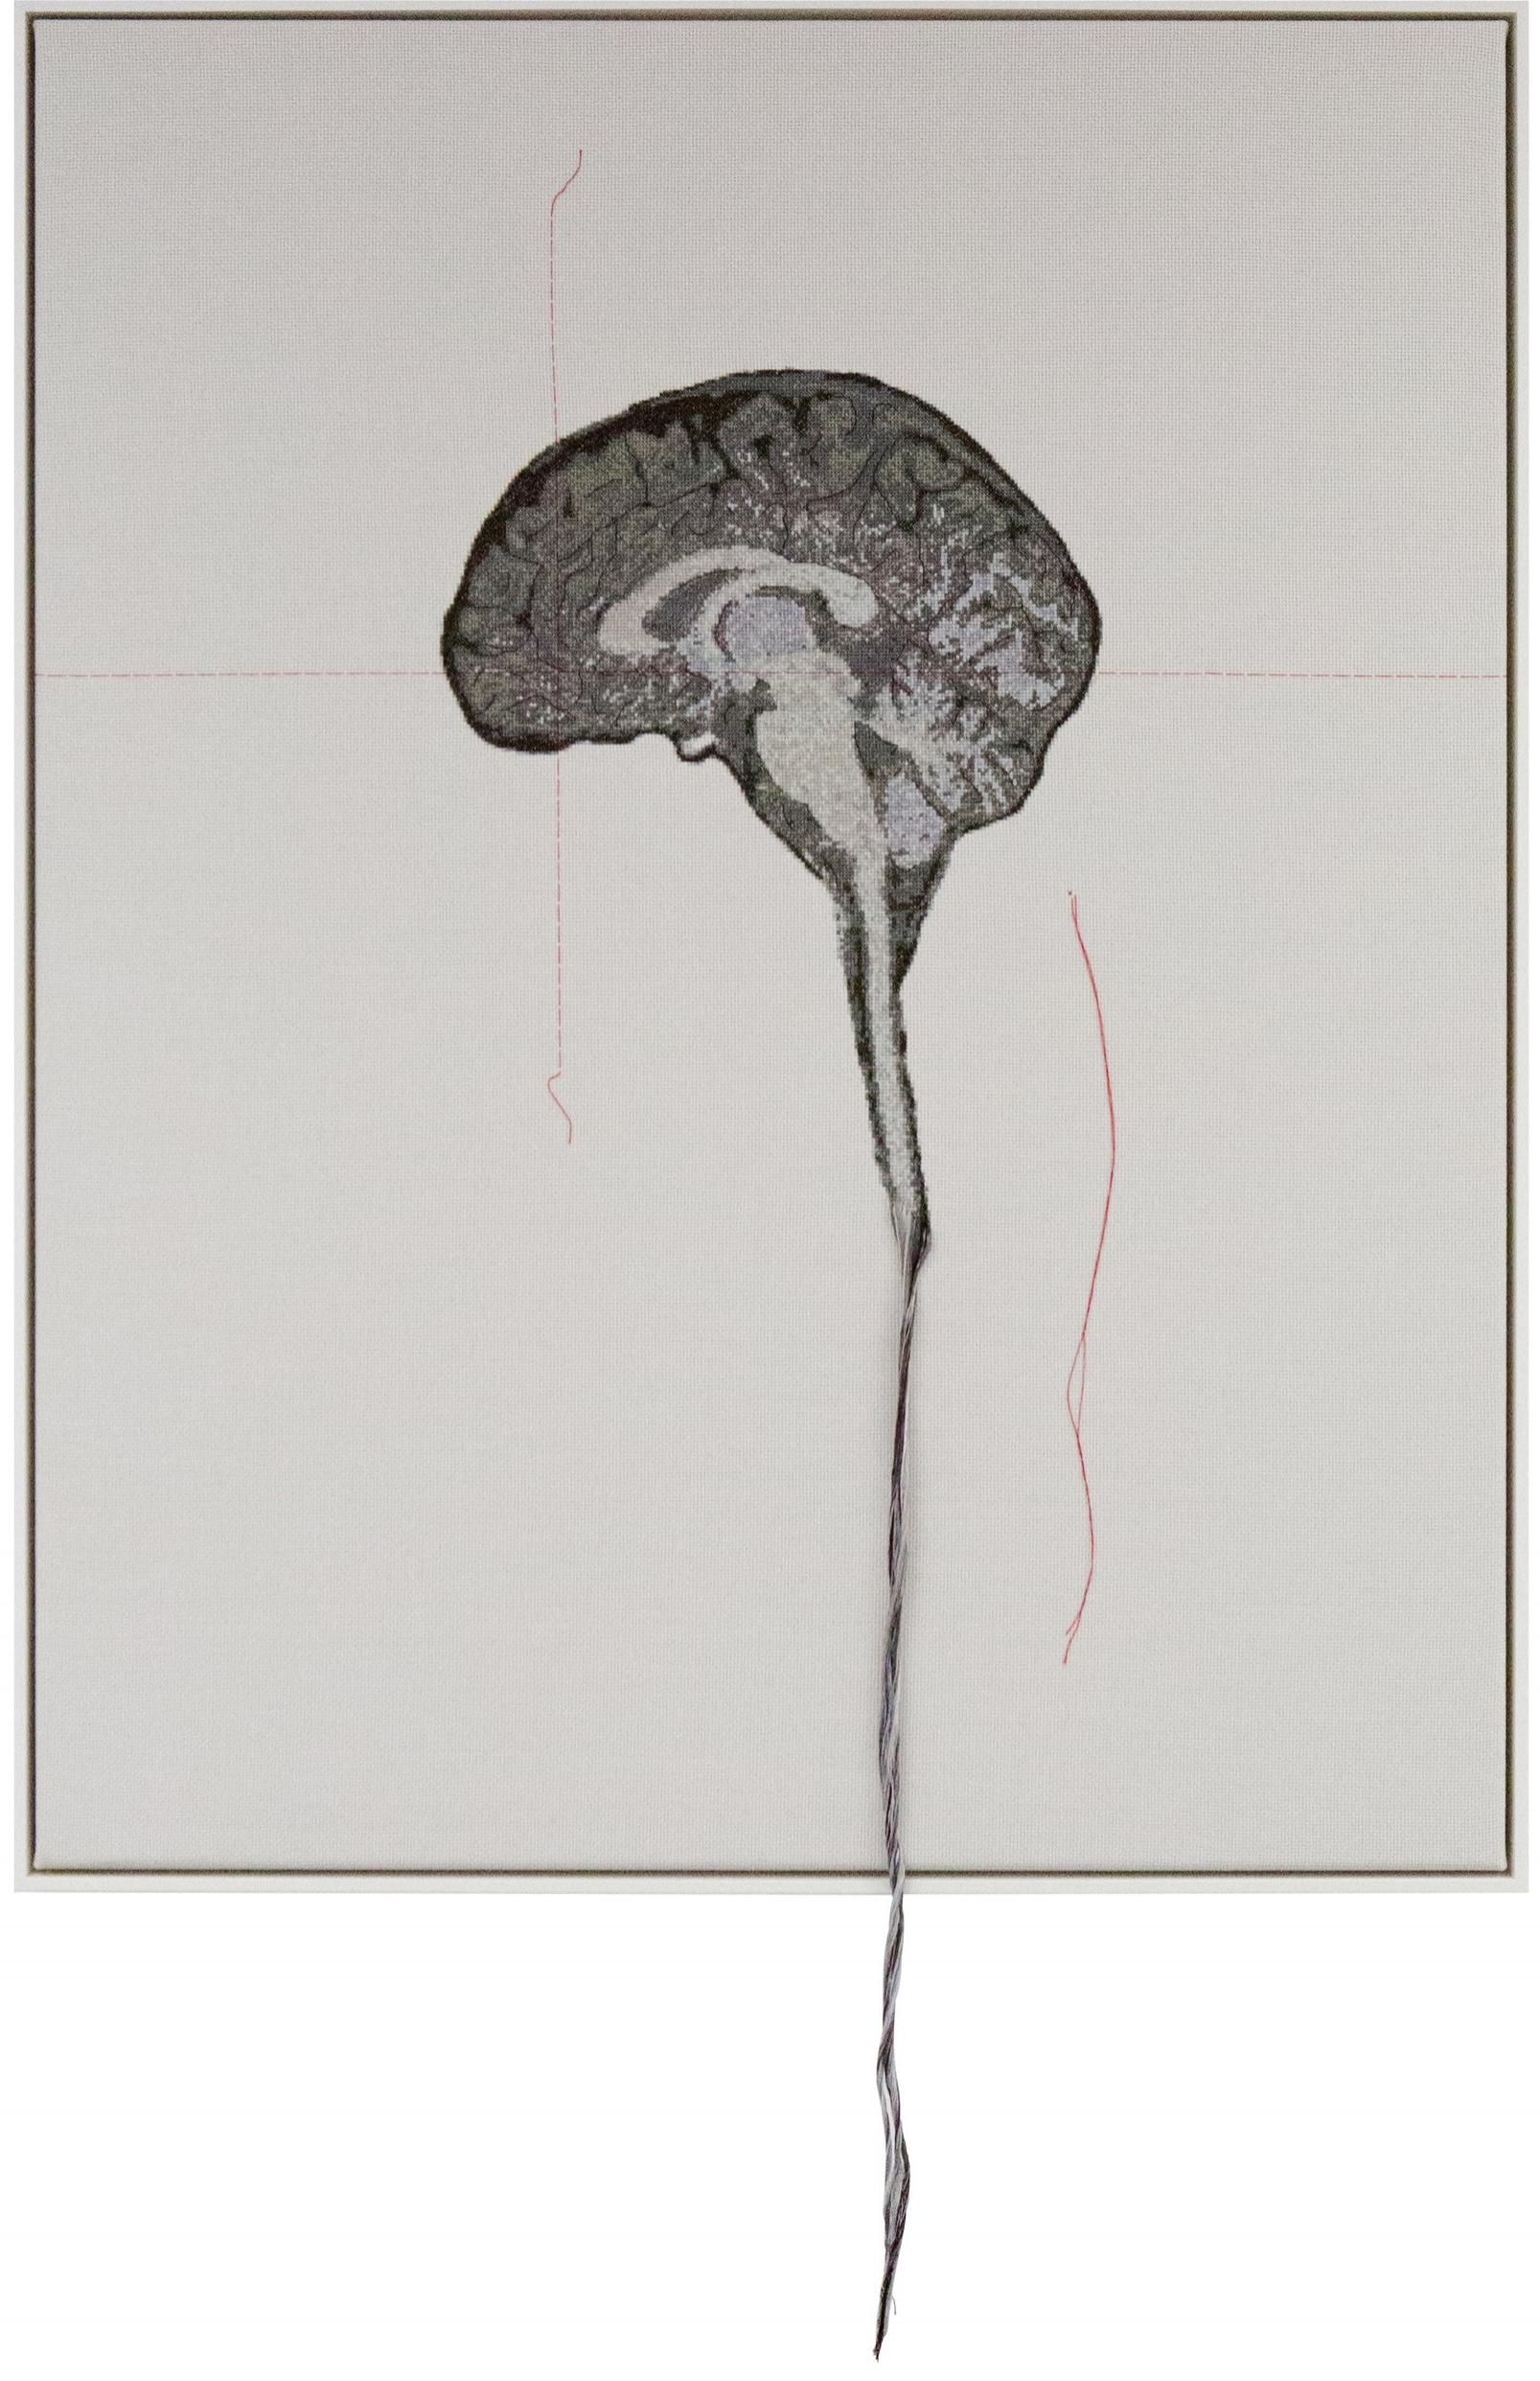 Lada Dedic Self Portrait; Artist's Brain Stranded cotton on aida cloth, 2016 1250 x 790 mm  Stitching time: 170 hours    photo Katrina James